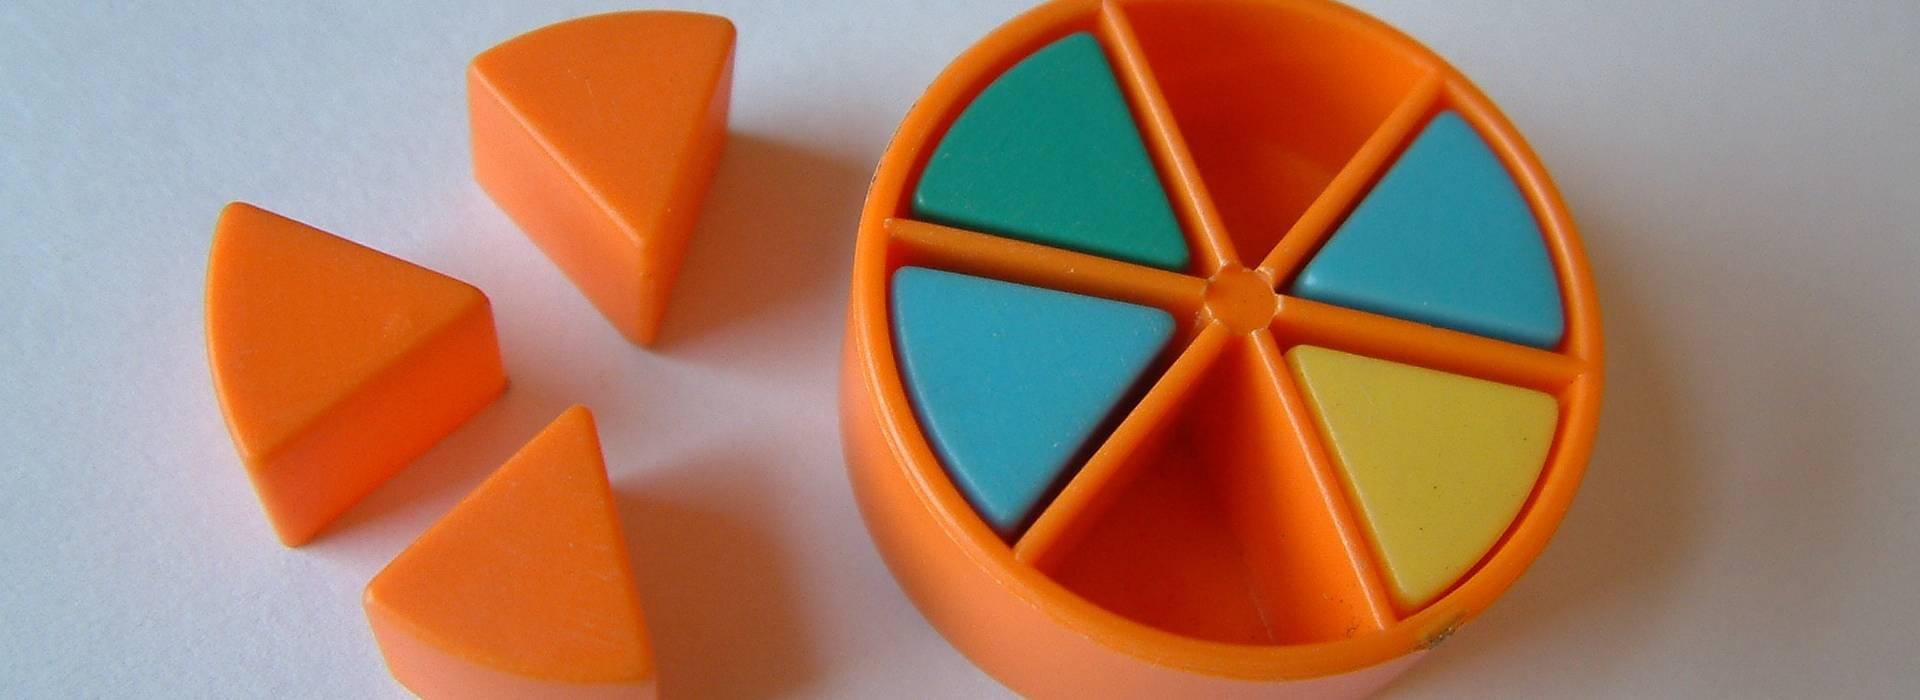 triangle-308175